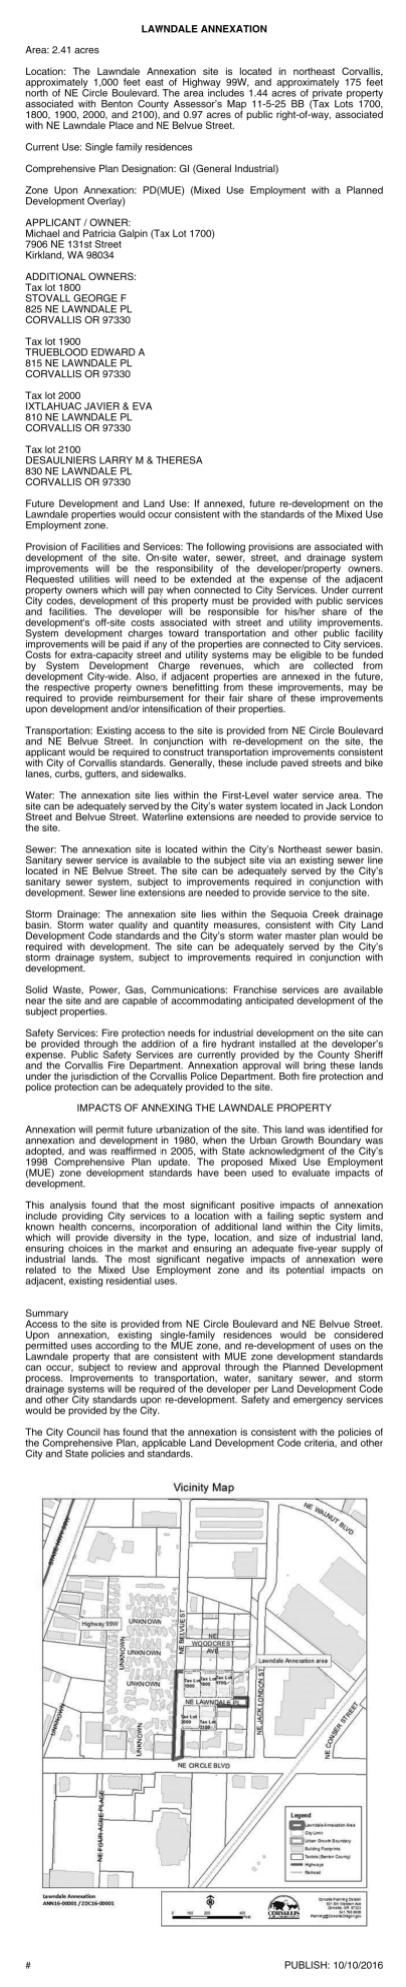 CITY OF CORVALLIS LEGALS